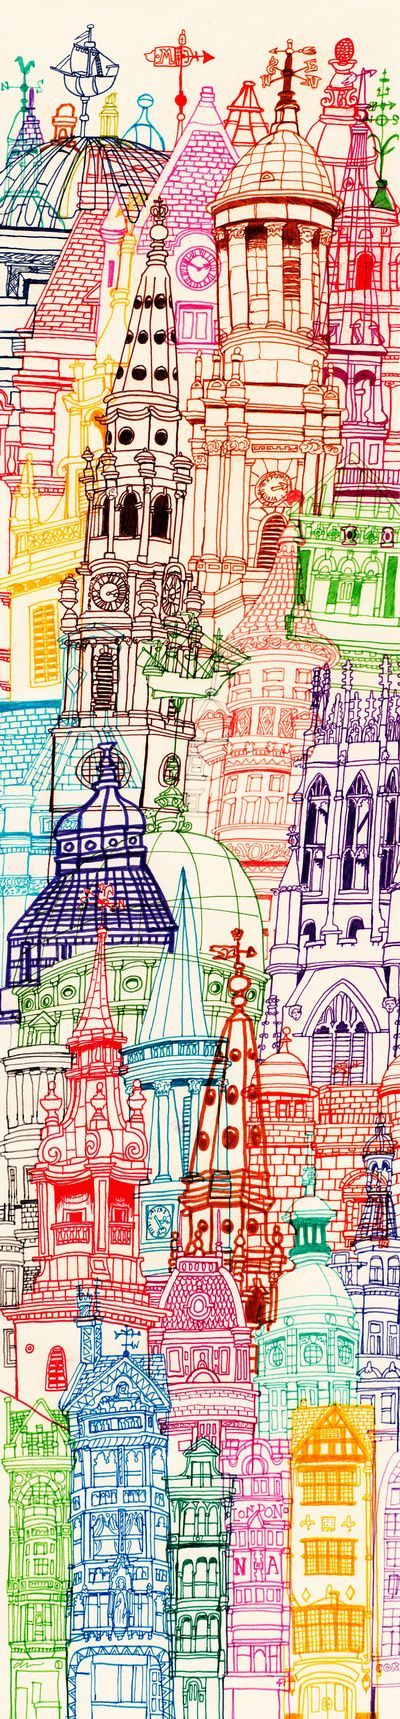 new city of colour.jpg